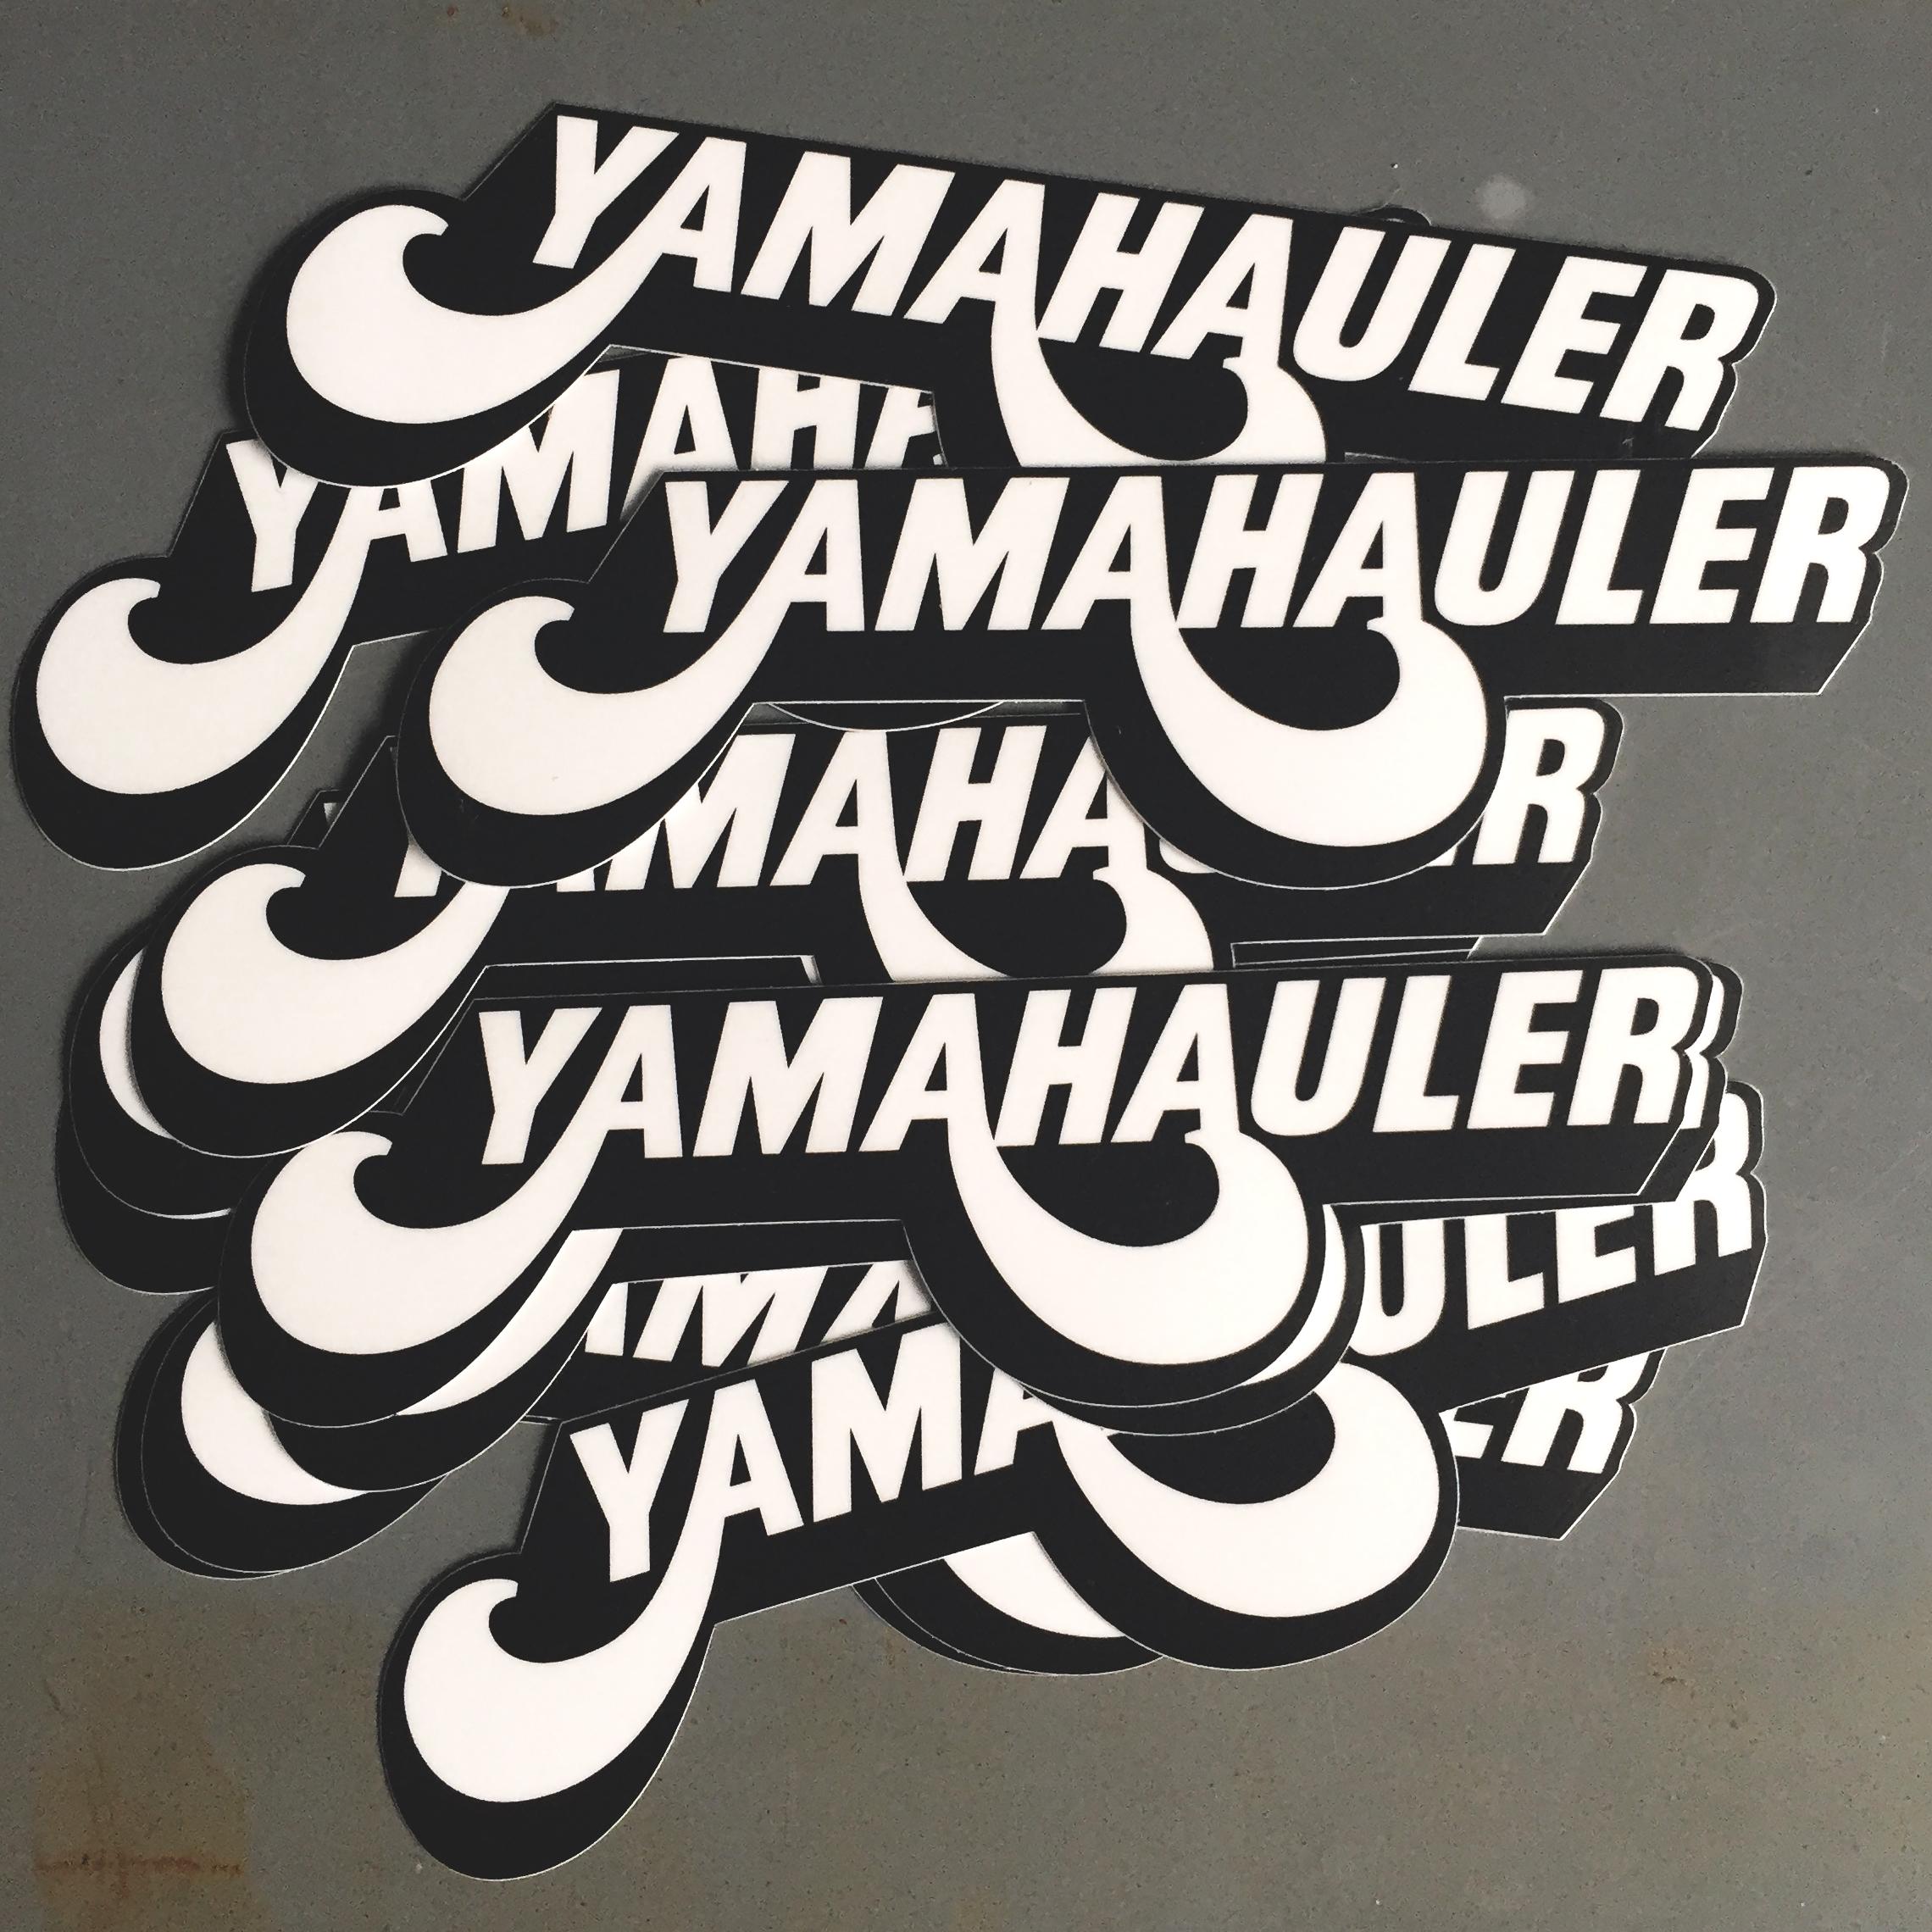 Yamahauler